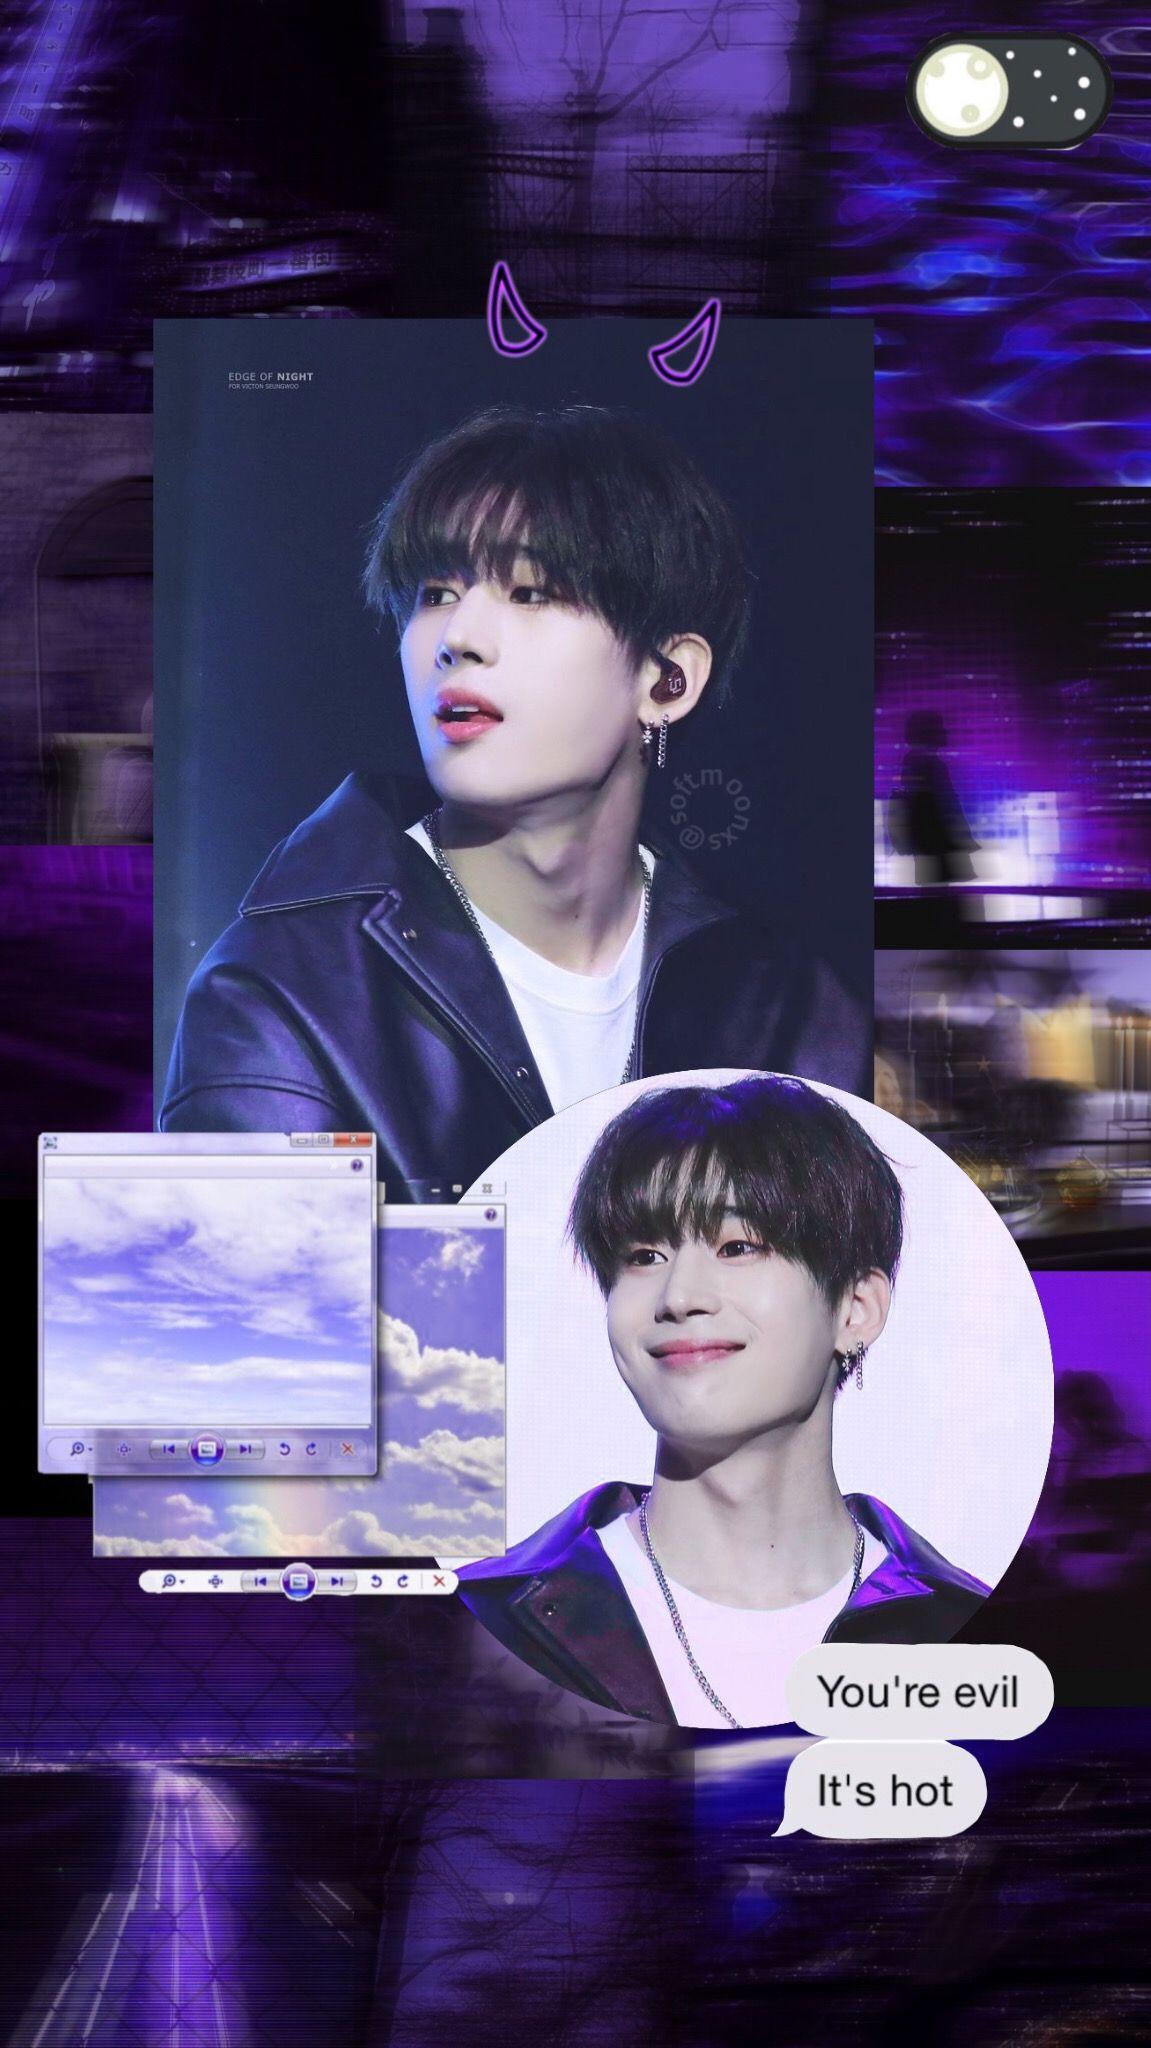 Wallpaper Victon Seungwoo Producex101 Kpop Edit Night